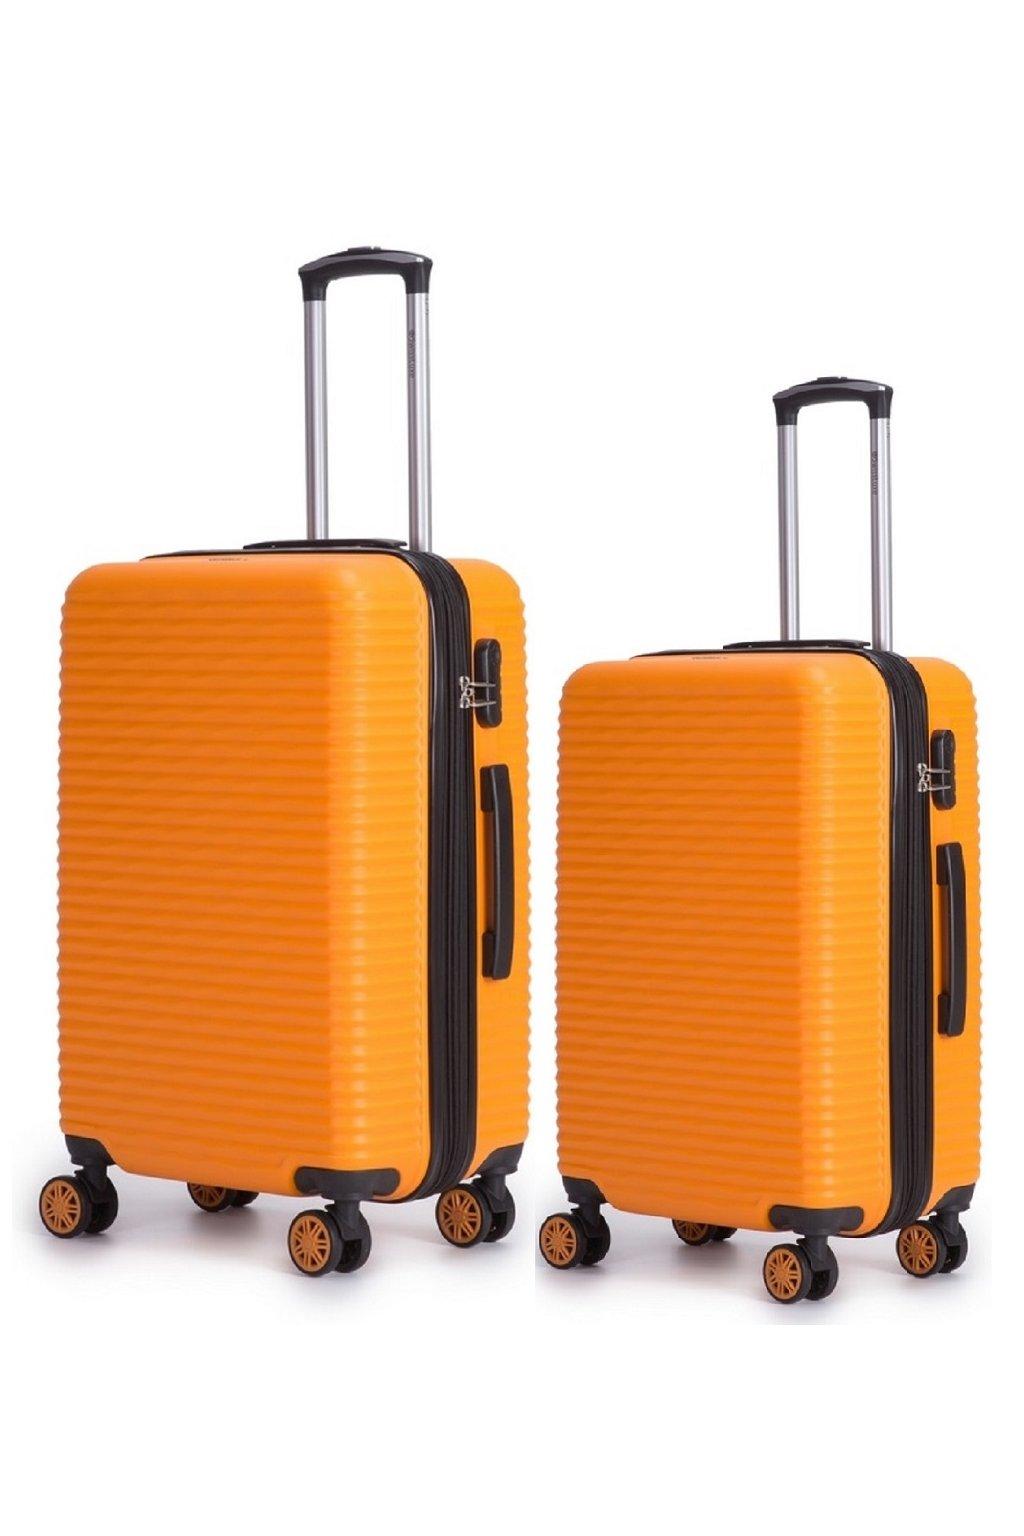 kufrland swiss+ luxz orange (9)